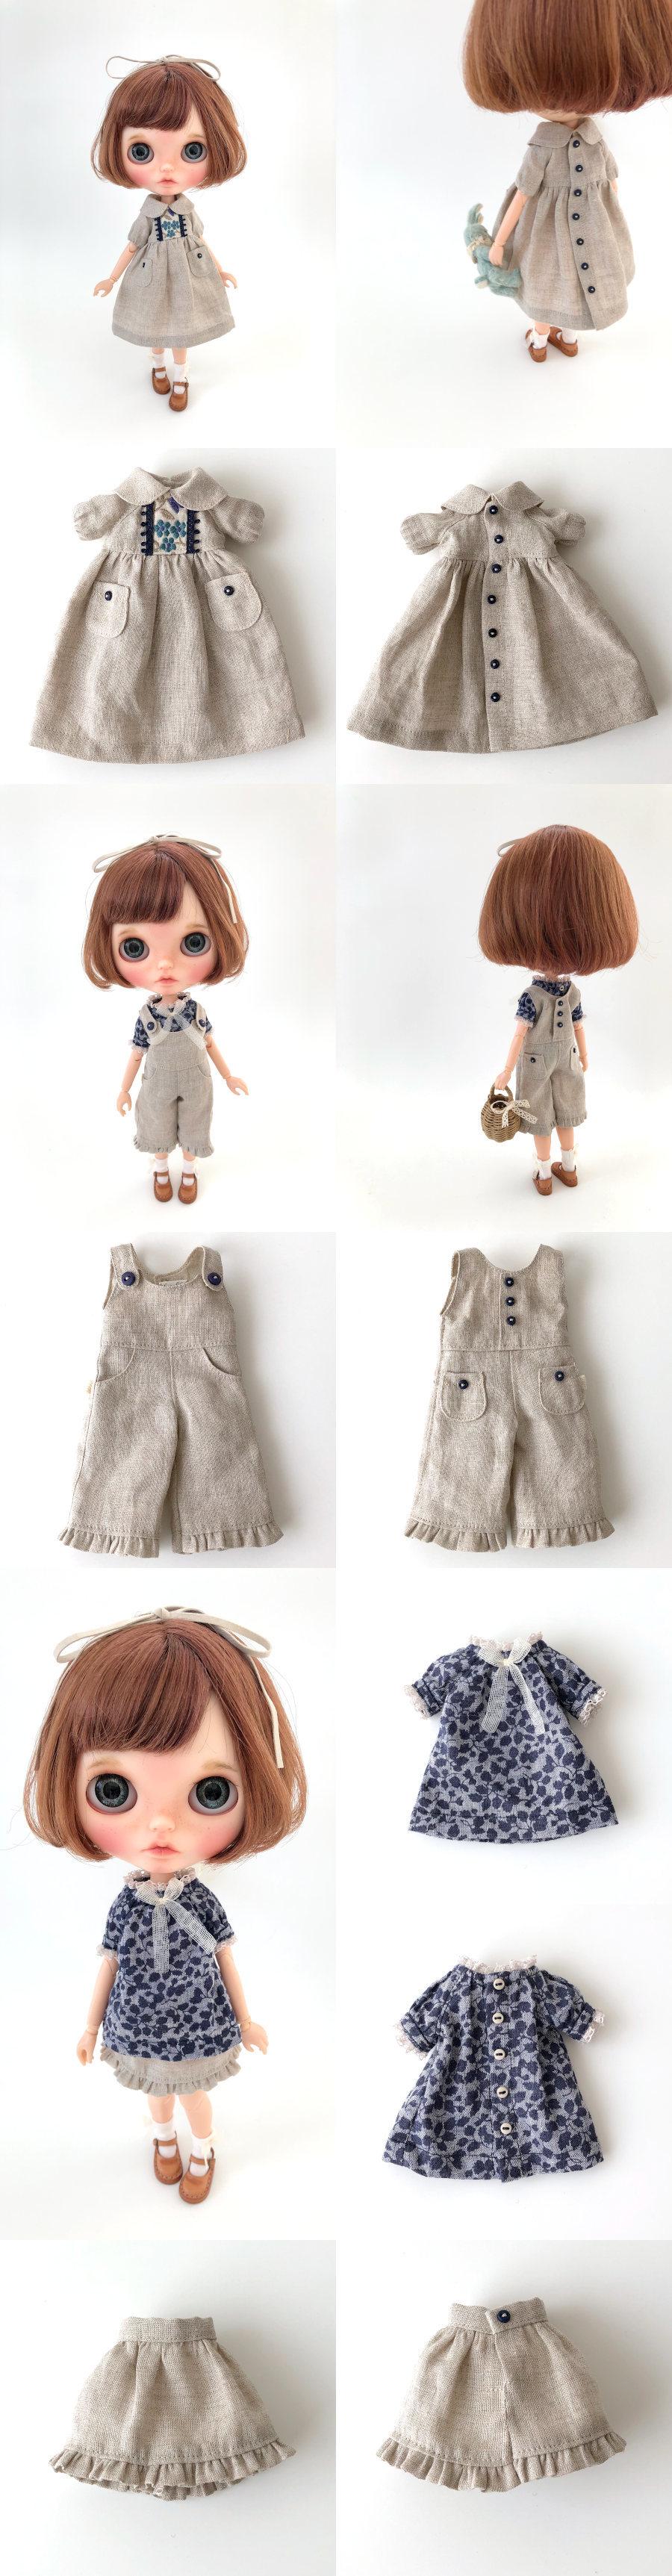 *lucalily * dolls clothes* Linen clothes set *_d0217189_15002638.jpg